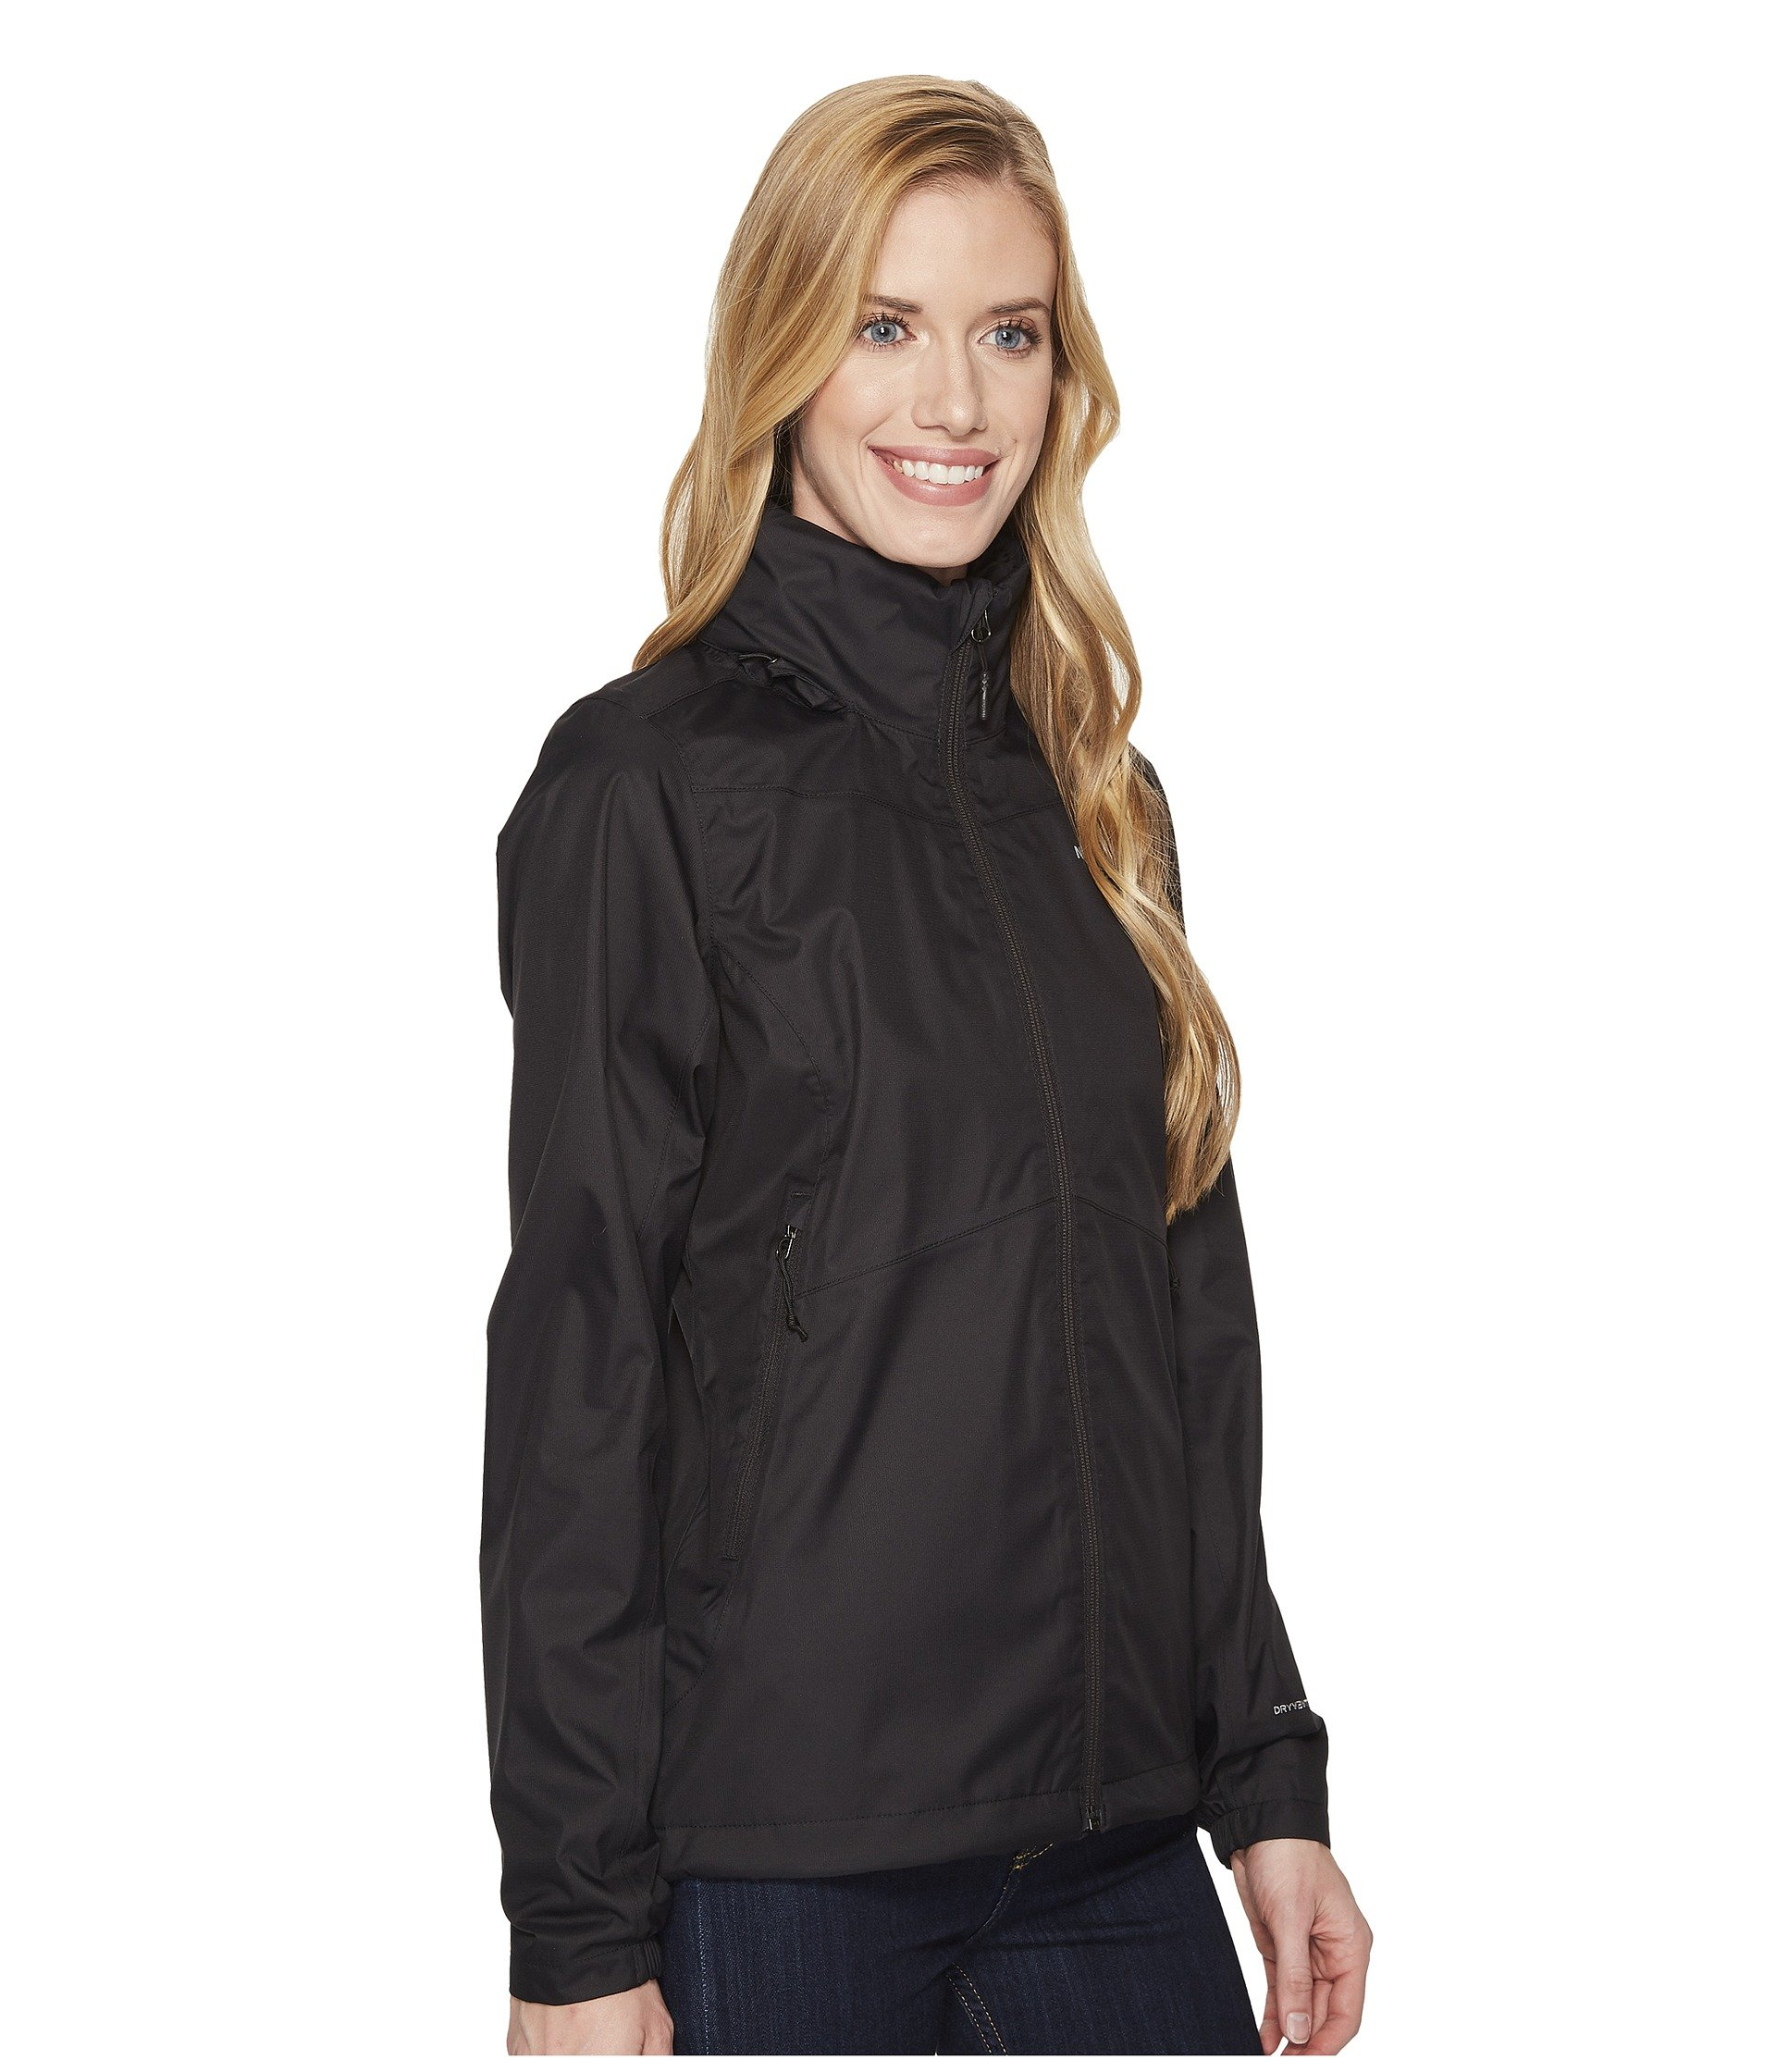 Plus 2 Tnf Resolve The Jacket Black North Face qPXPxt0